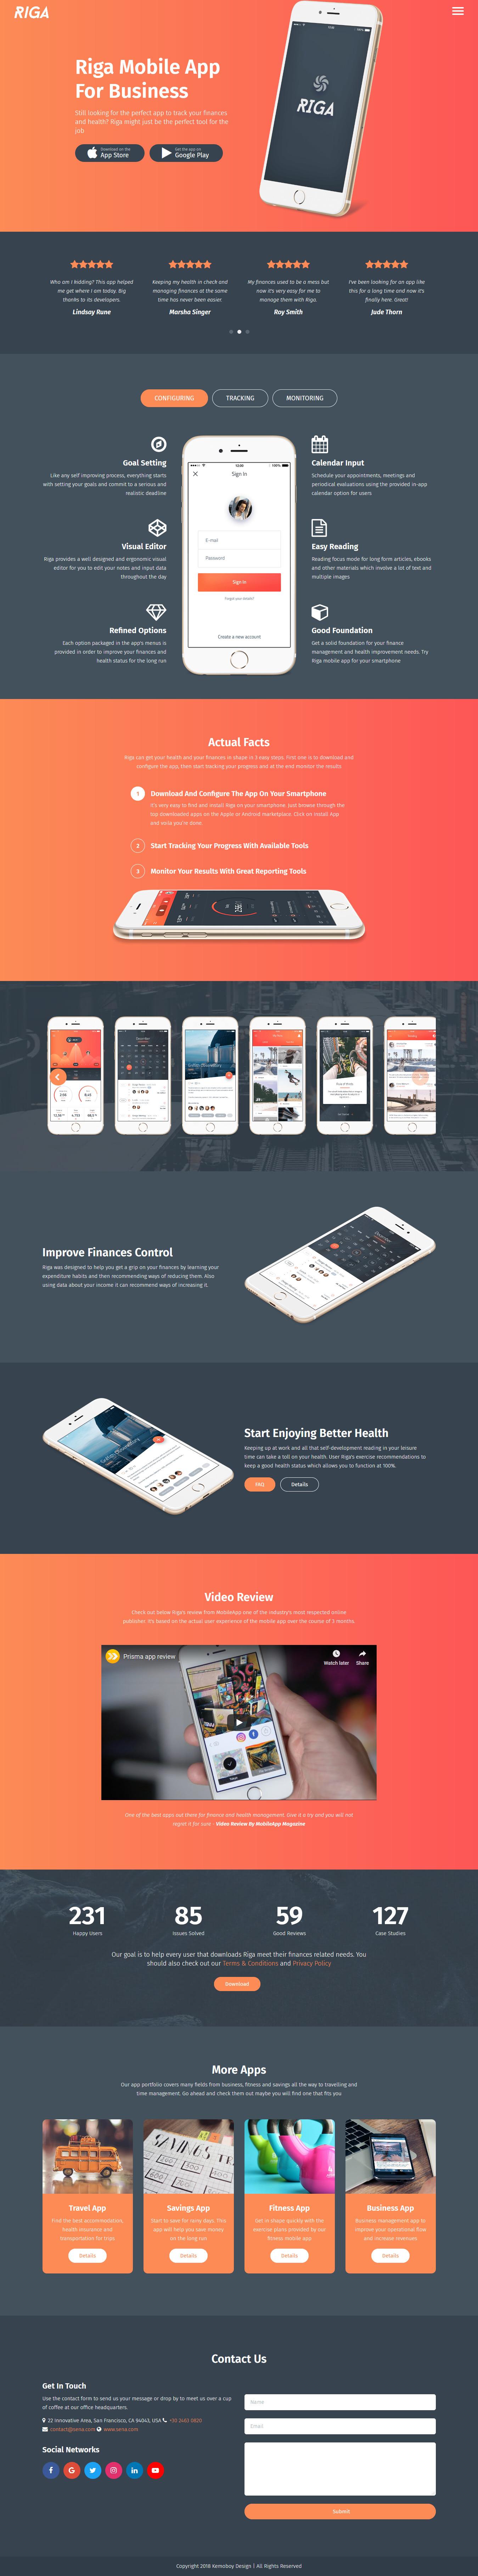 riga best premium mobile app wordpress theme - 10+ Best Premium Mobile App WordPress Themes